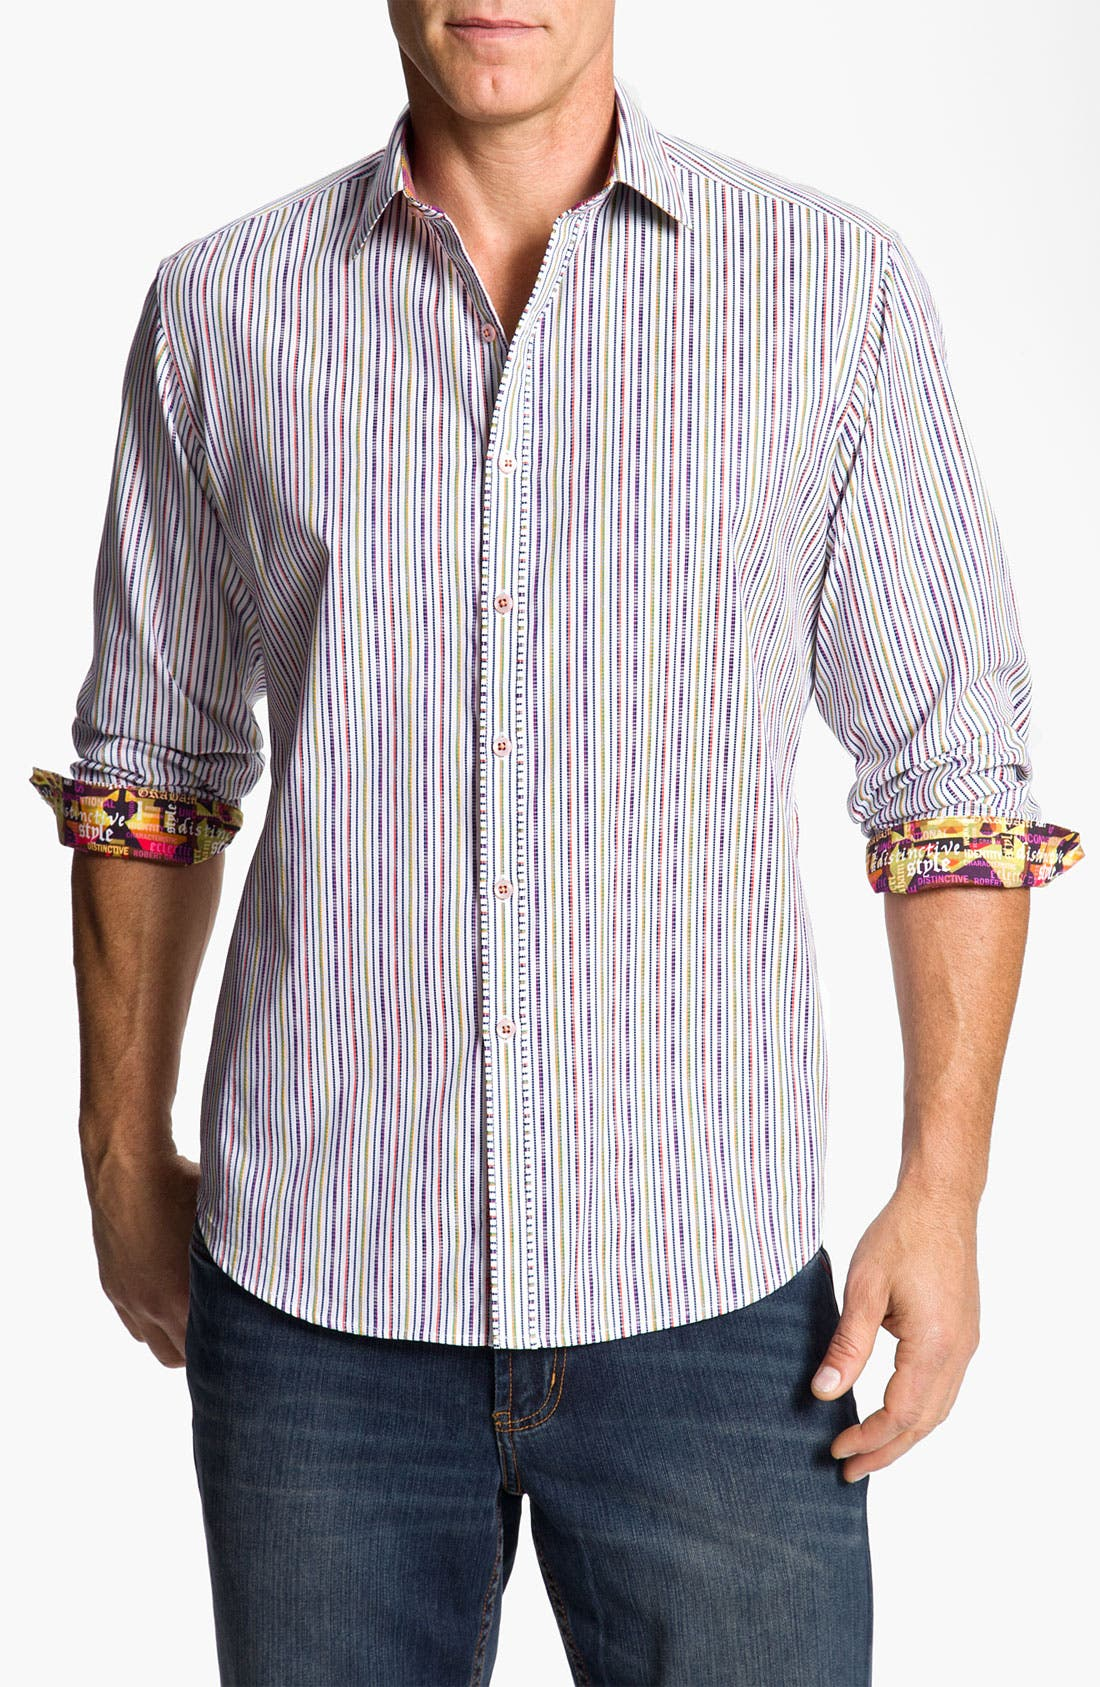 Alternate Image 1 Selected - Robert Graham 'Lemans' Sport Shirt